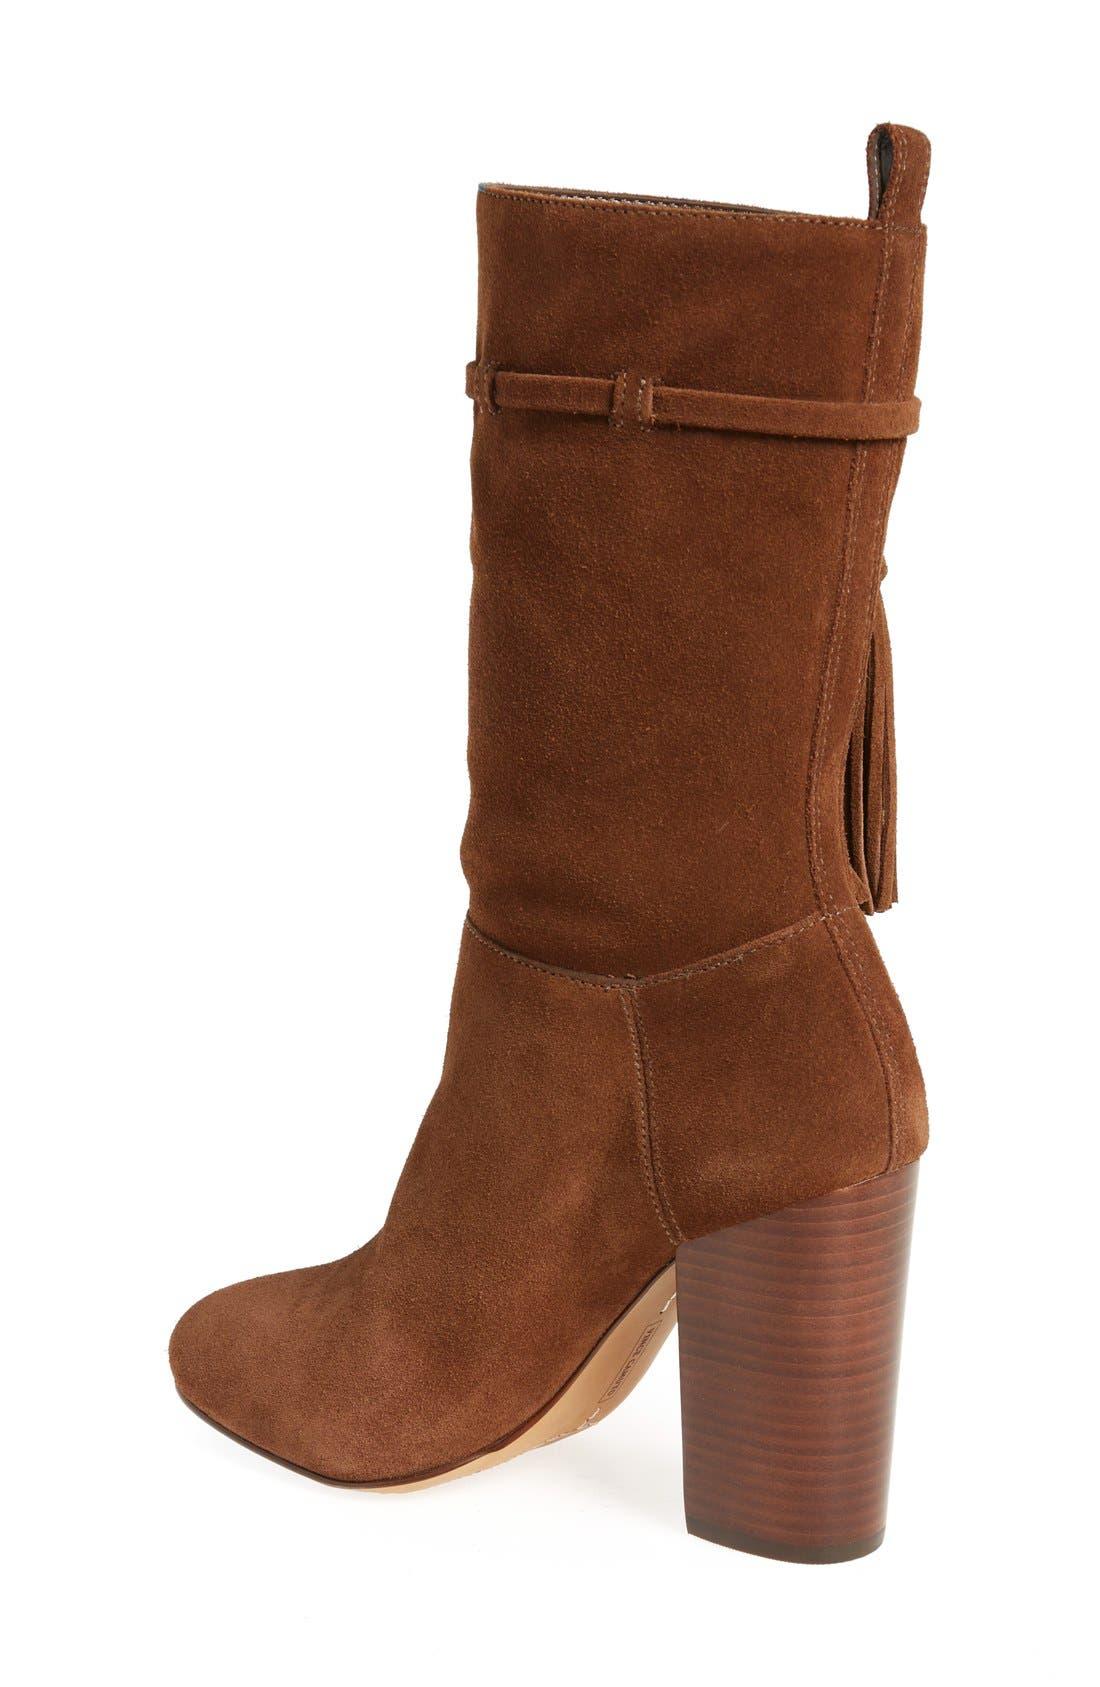 'Fermel' Slouch Tassel Boot,                             Alternate thumbnail 2, color,                             Brown Suede